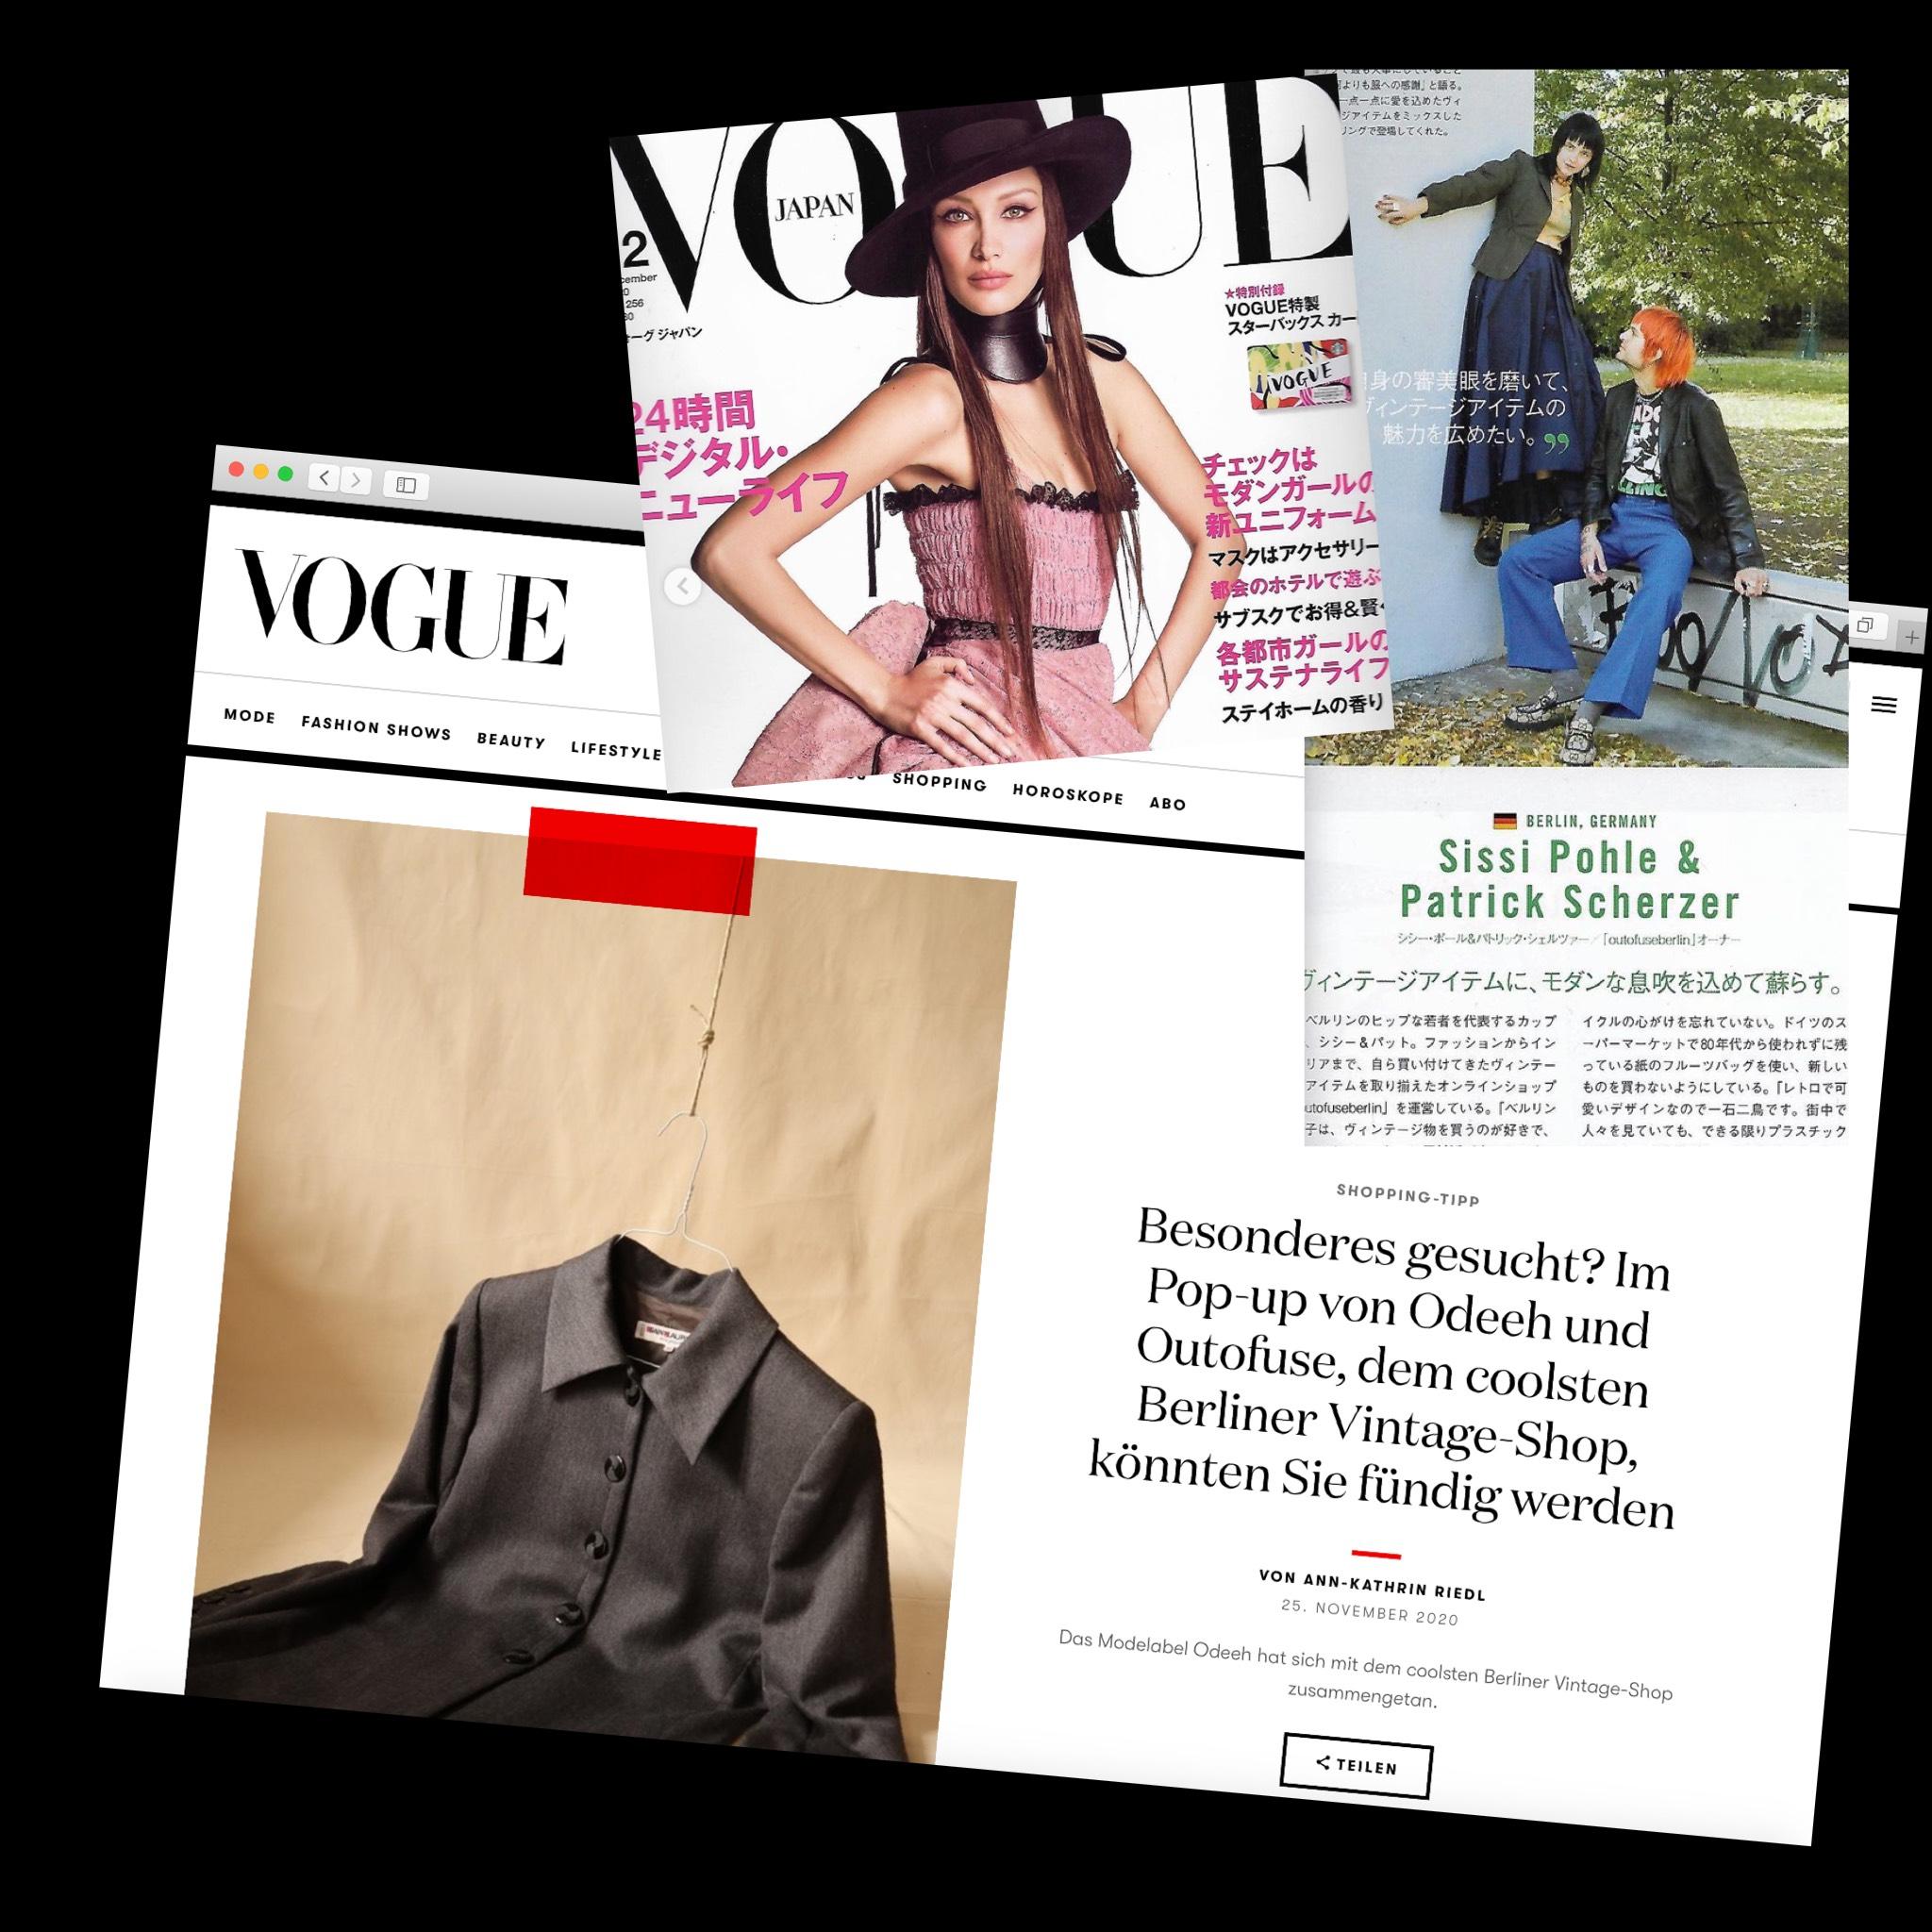 fashion-brand-outofuseeberlin